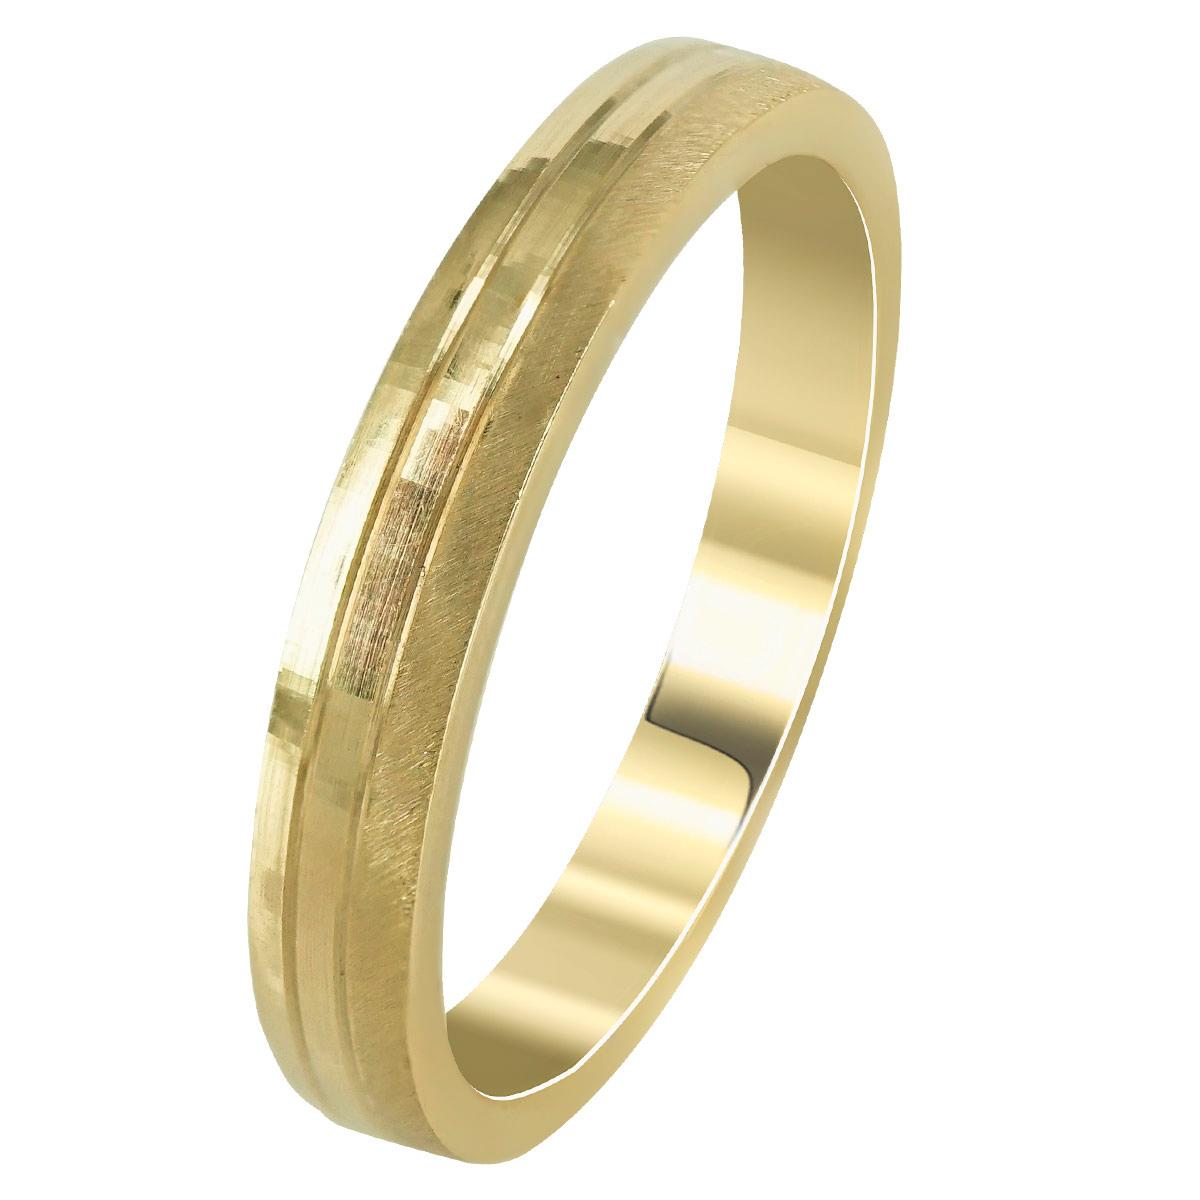 Kίτρινη Χρυσή Βέρα Γάμου WR265 k14